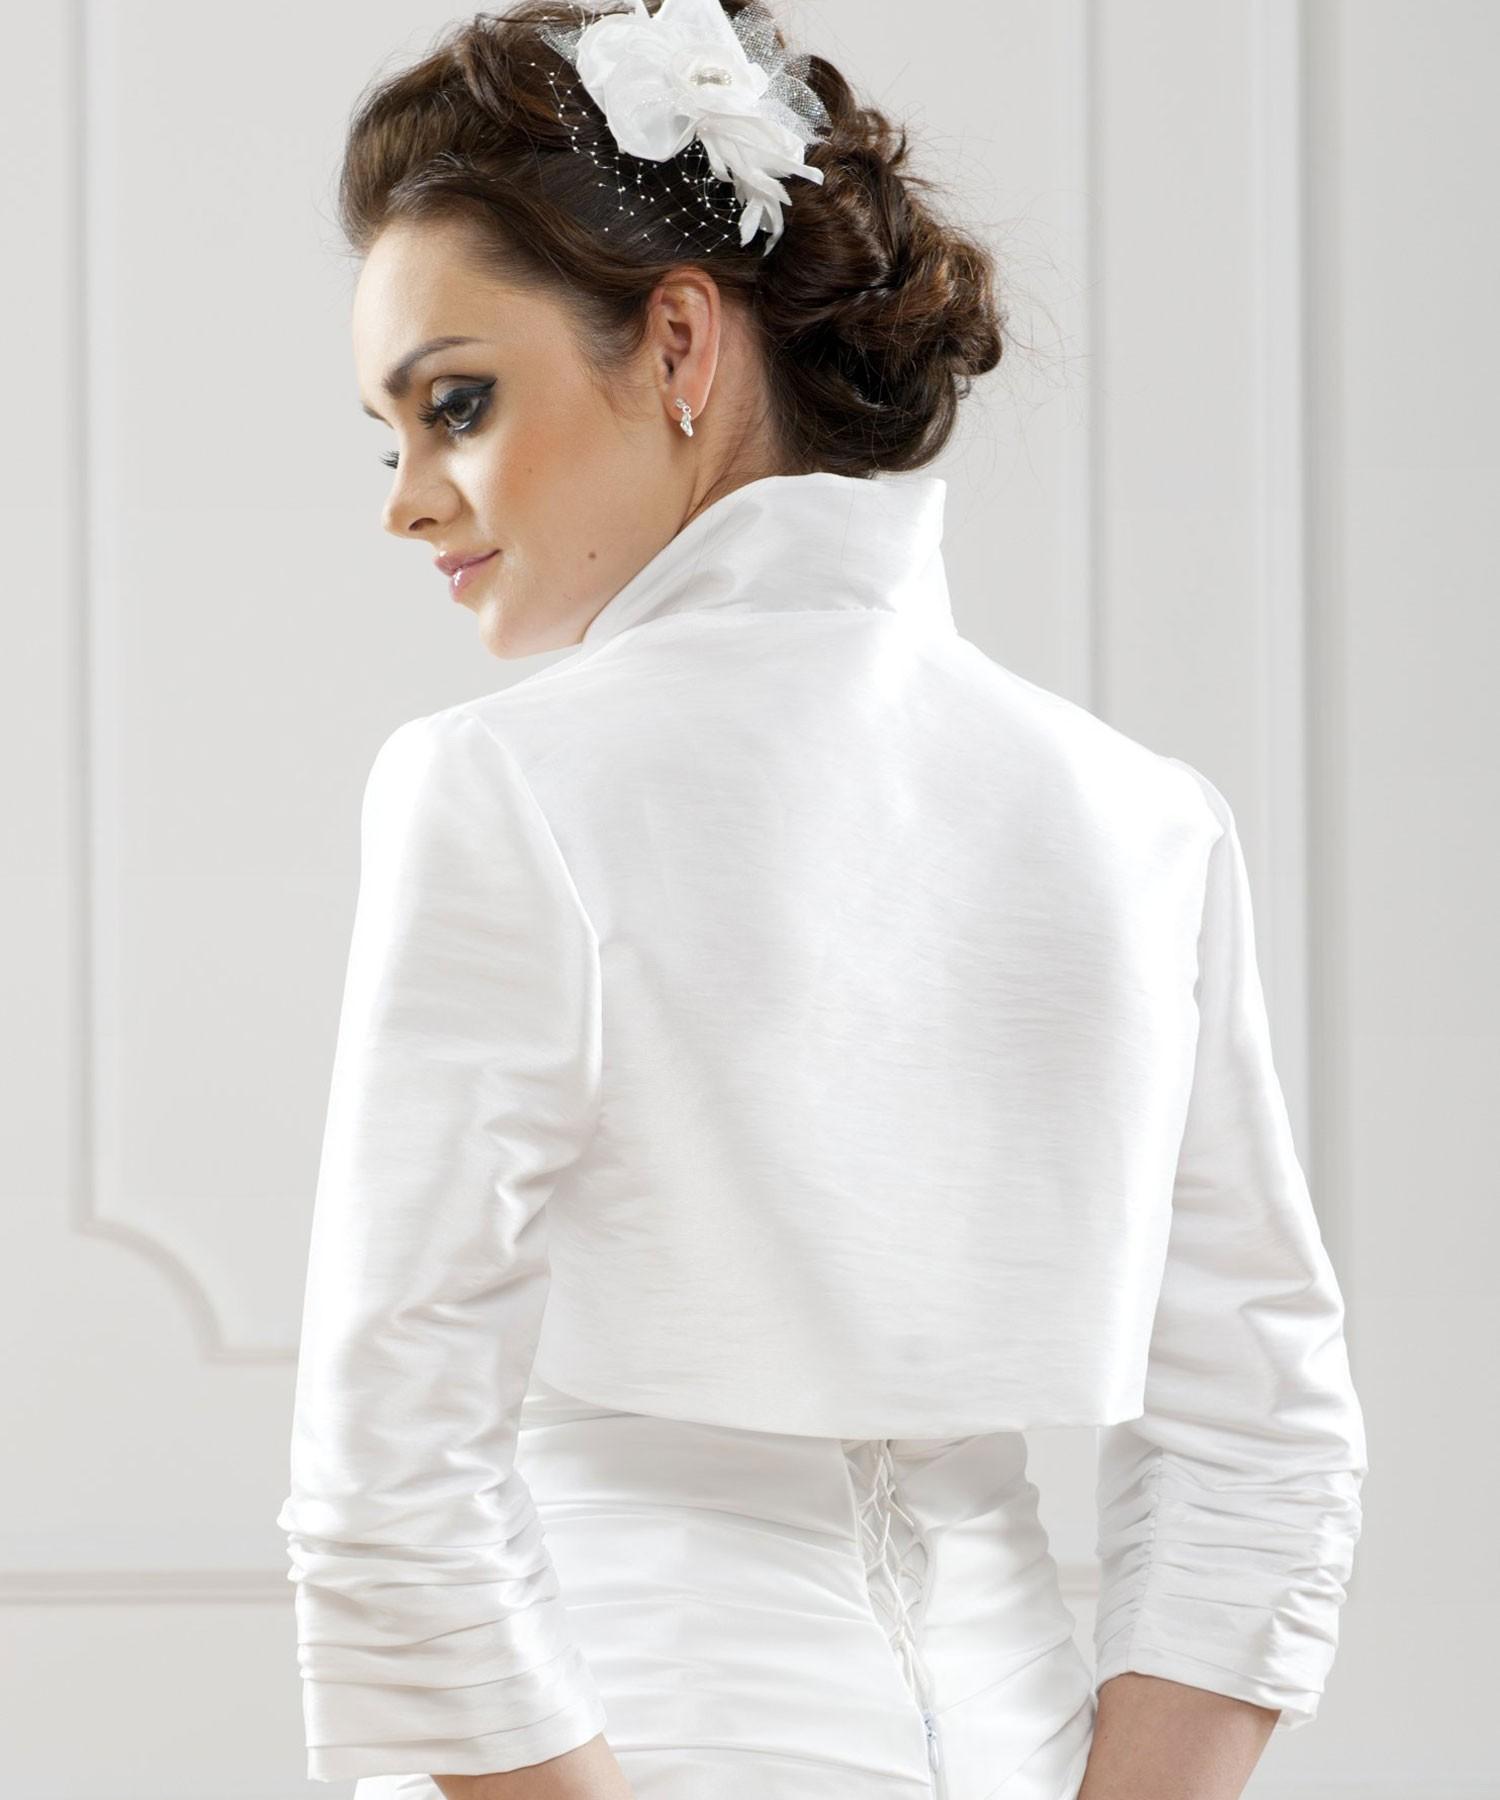 bolro mariage taffetas melissa blanc bolro marie taffetas melissa blanc - Bolero Mariage Blanc